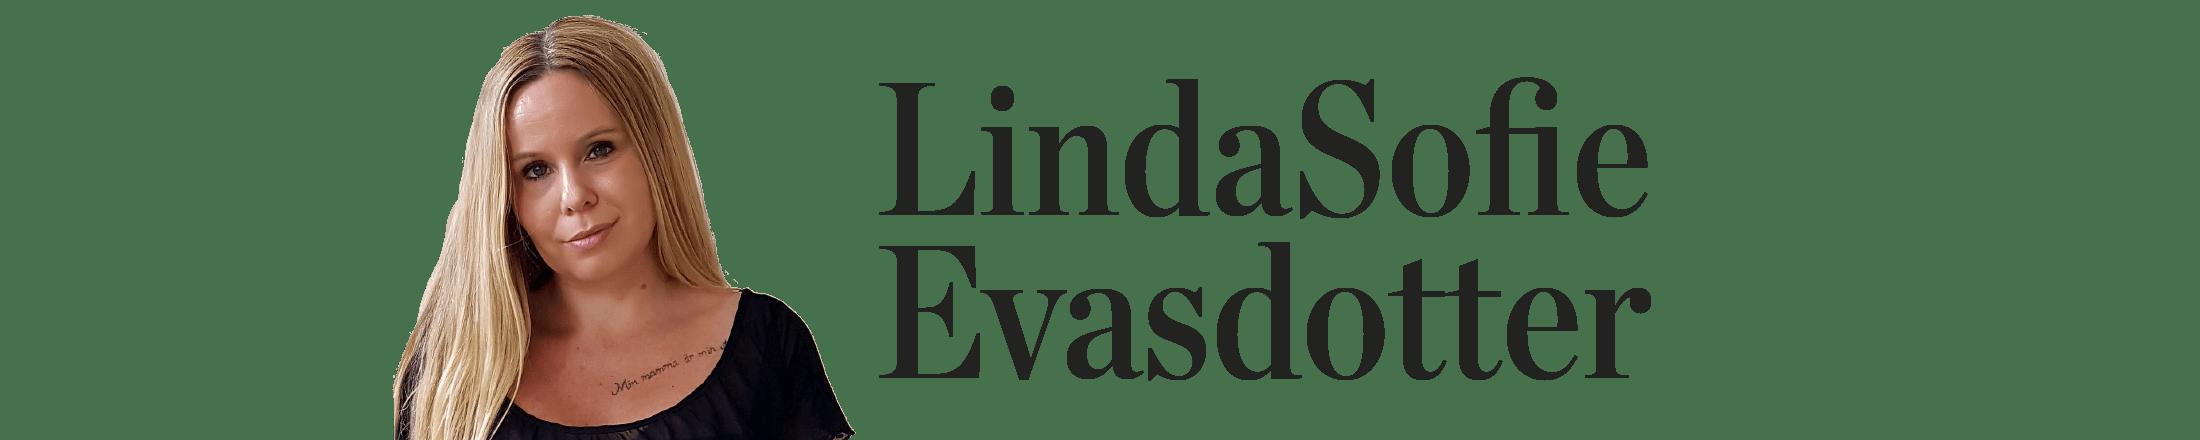 LindaSofie Evasdotter